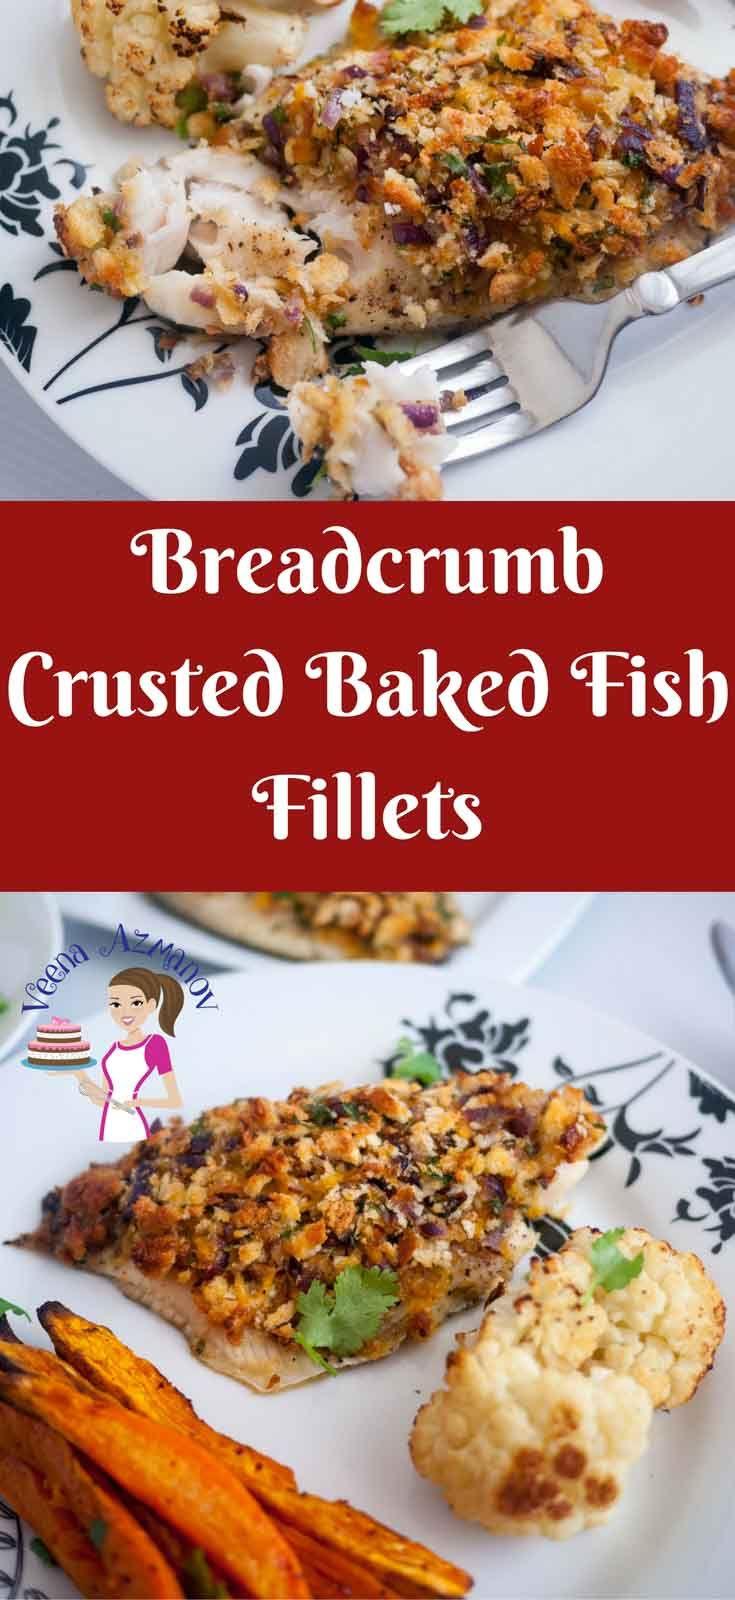 Tasty baked fish fillet recipes on pinterest easy baked for Fresh fish recipes